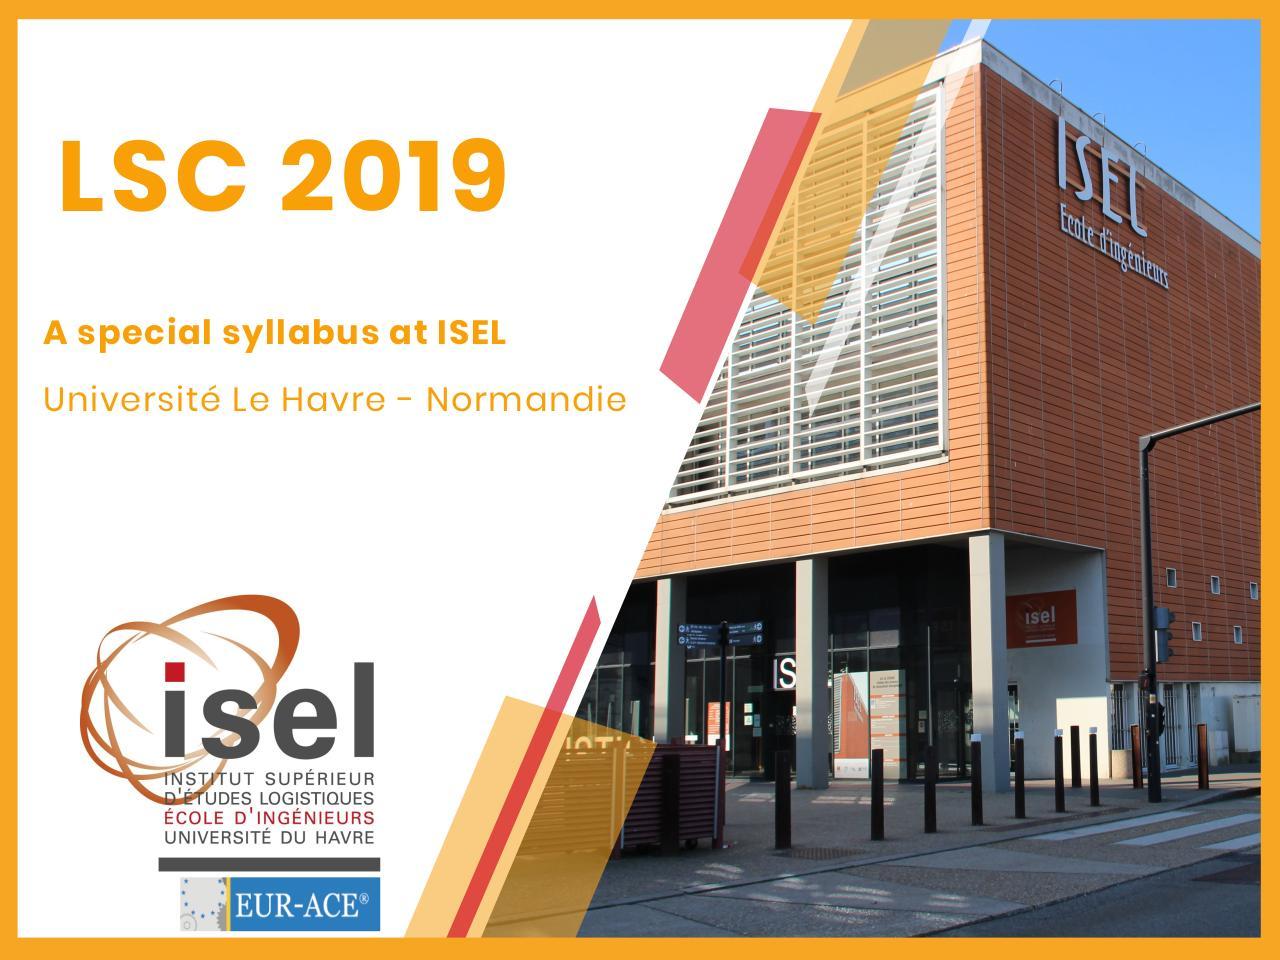 Coursework 2019 ISEL - Fichier PDF